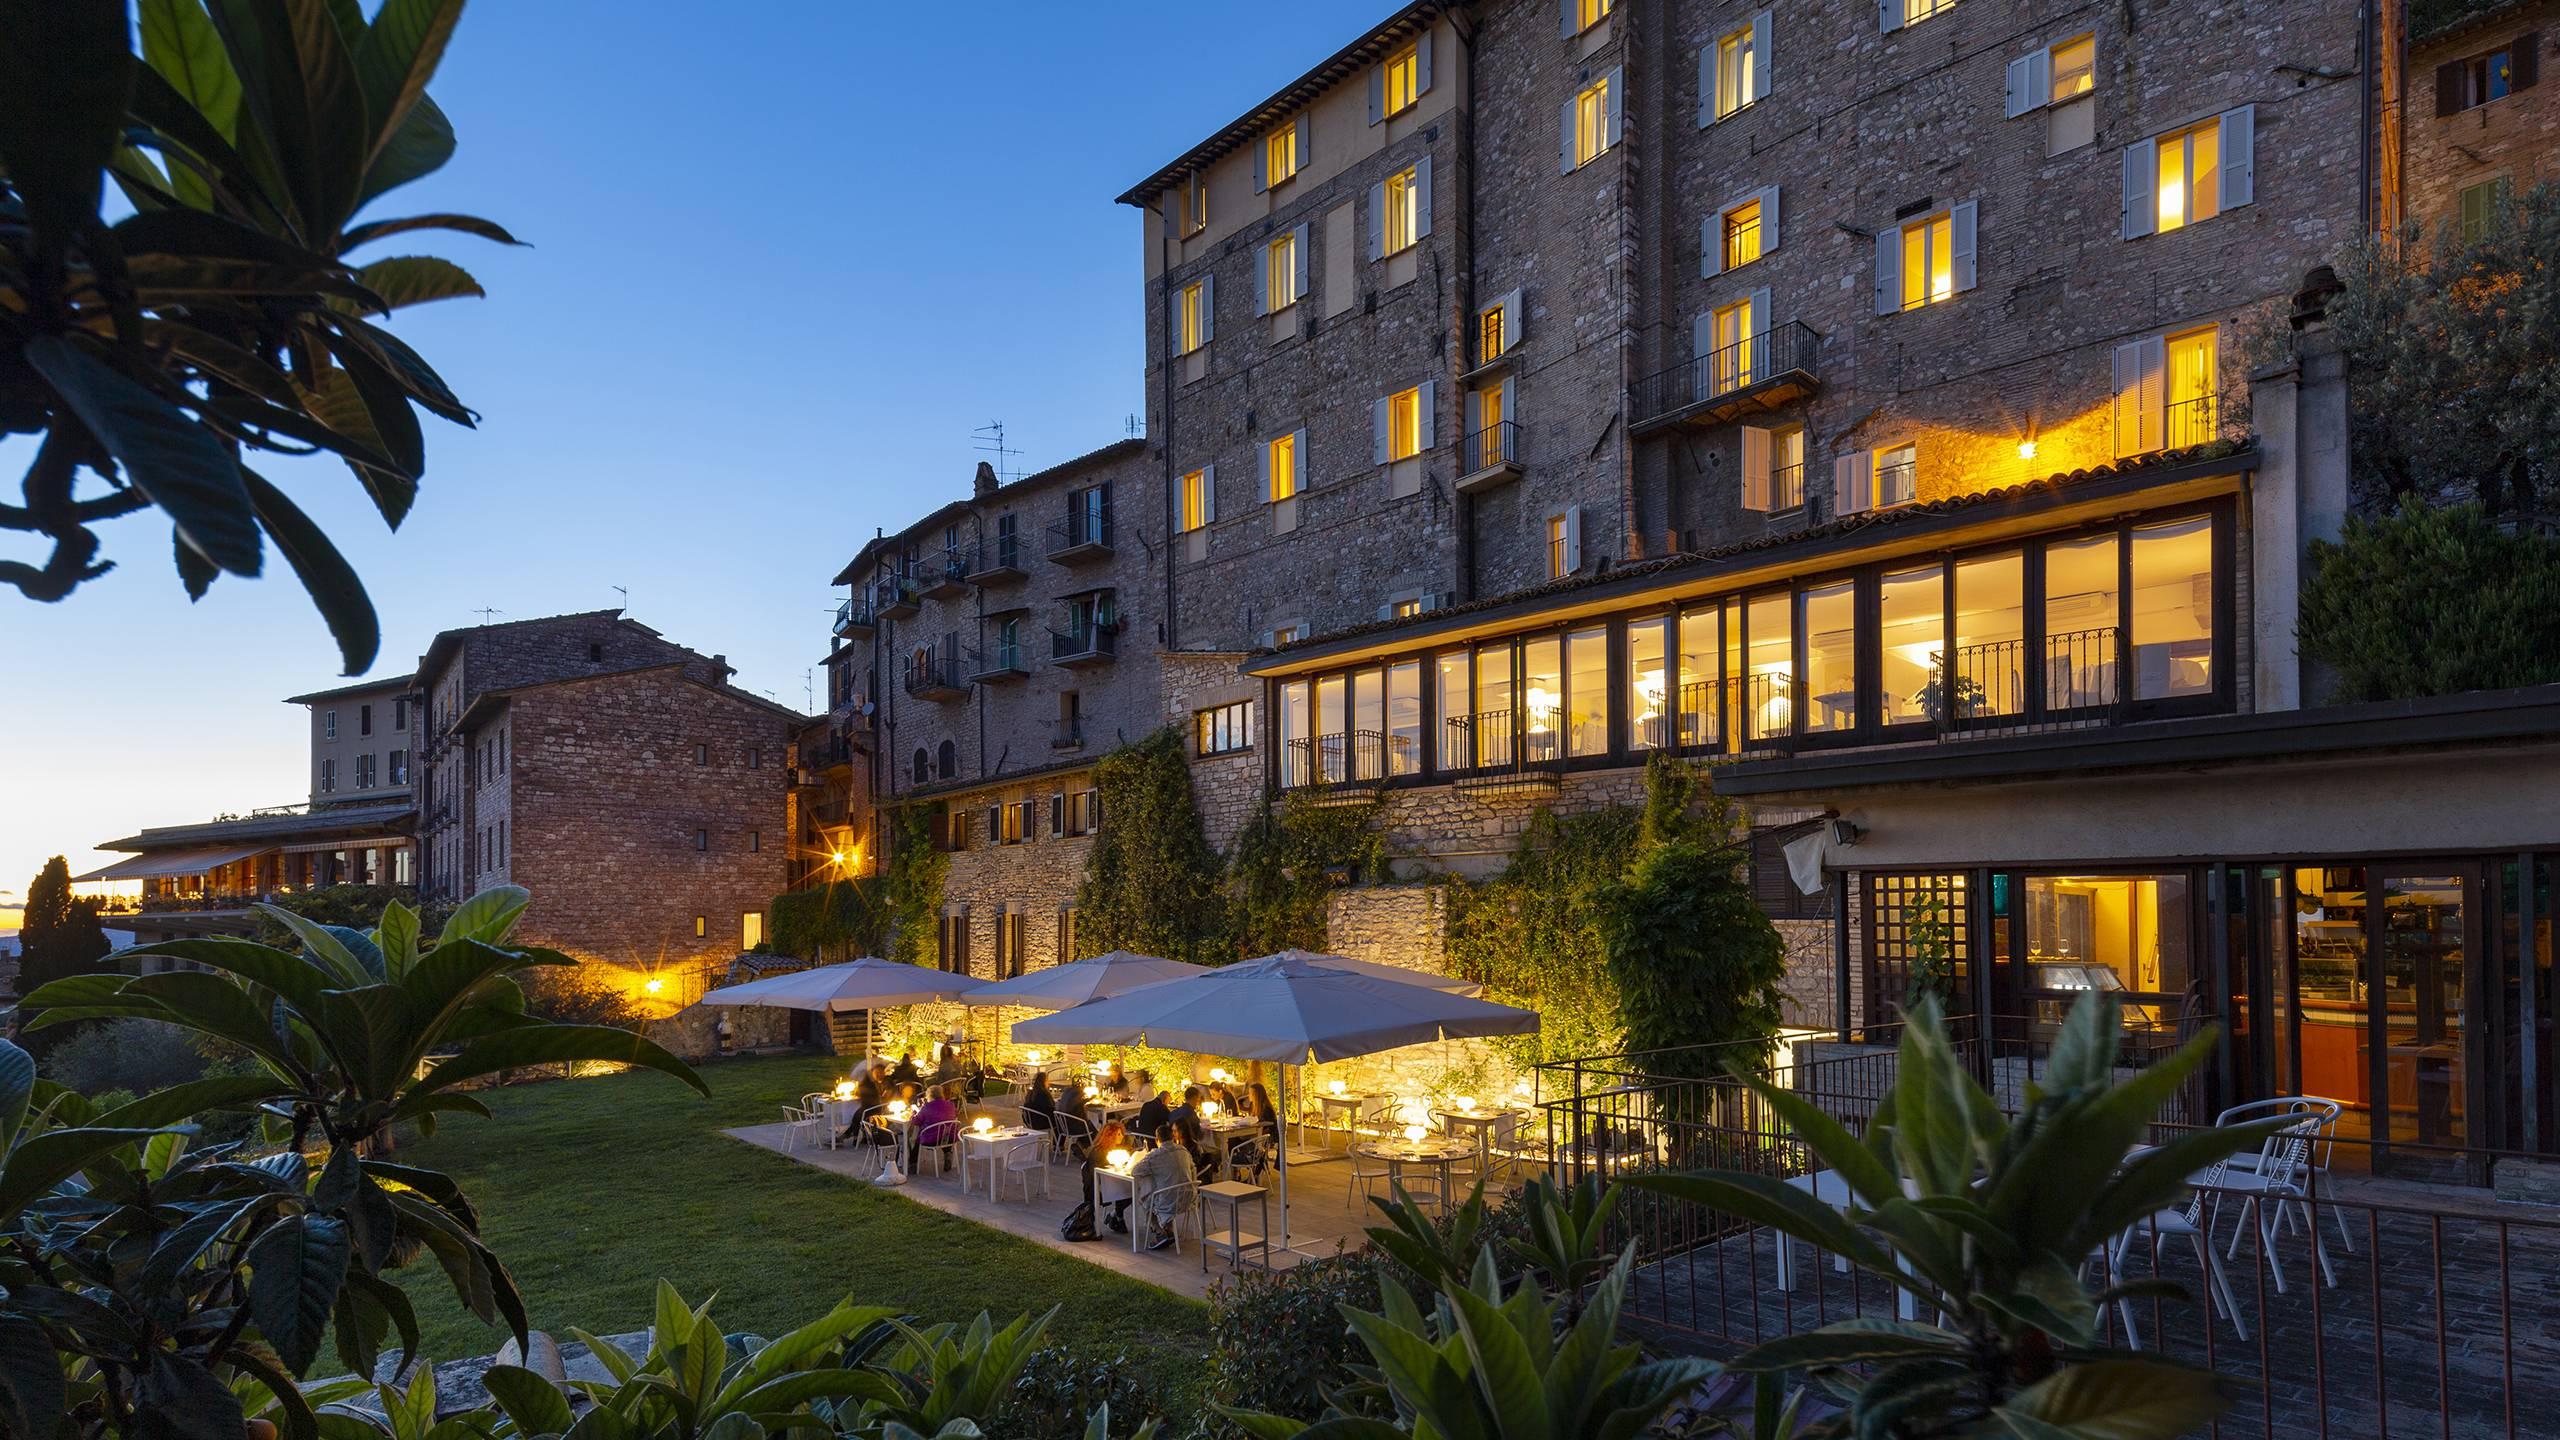 Fontebella-Palace-Hotel-Assisi-illuminated-exterior